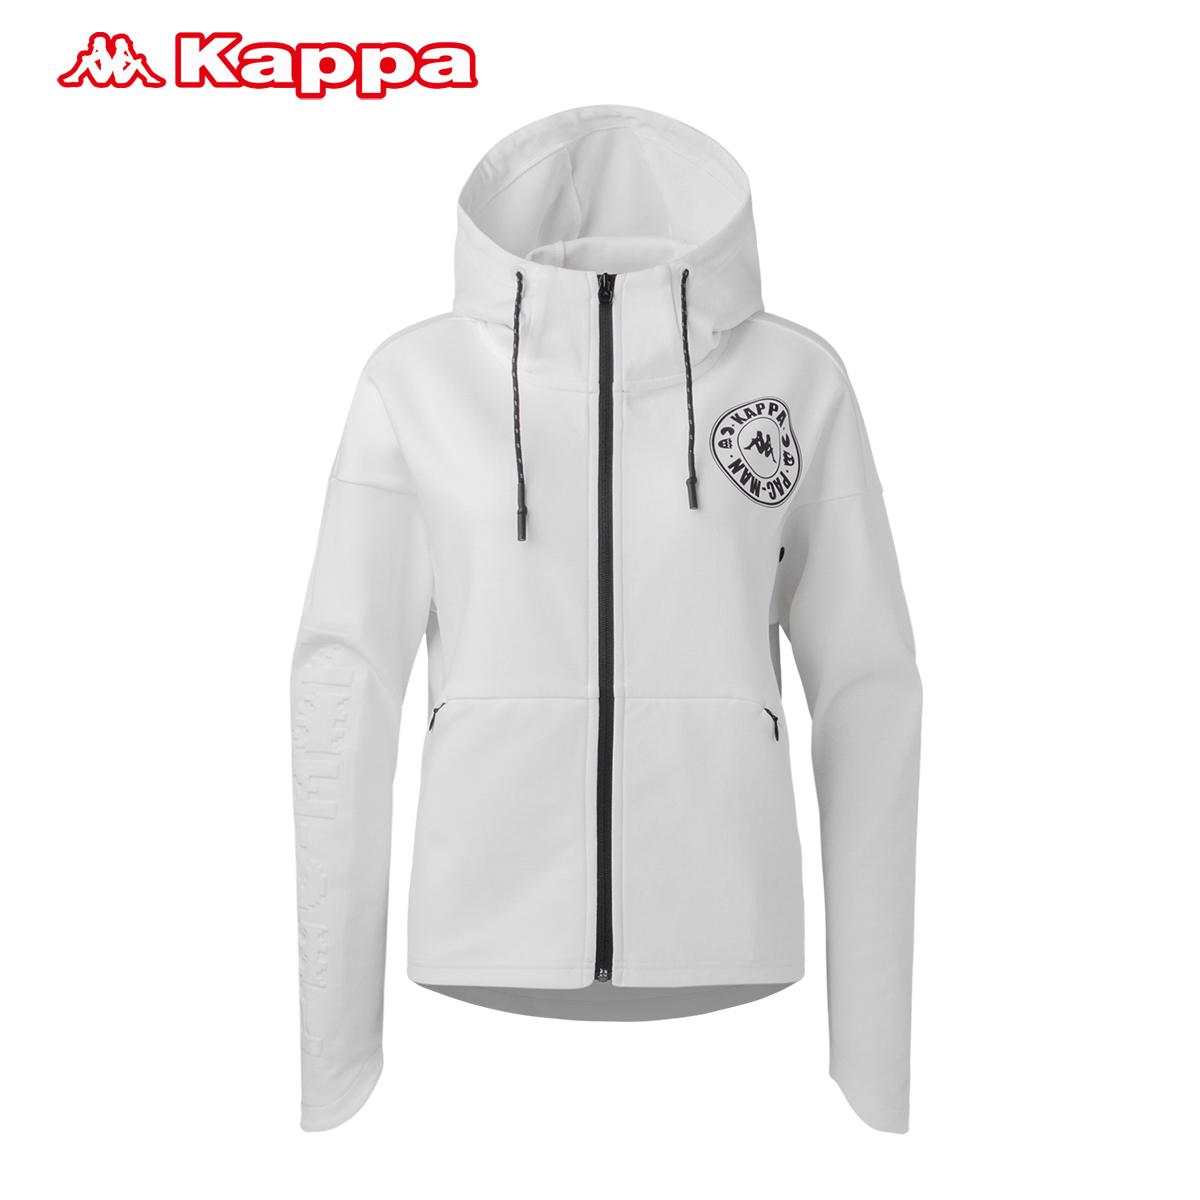 Kappa背靠背联名Pacman 情侣款女子运动卫衣卡帕休闲帽衫